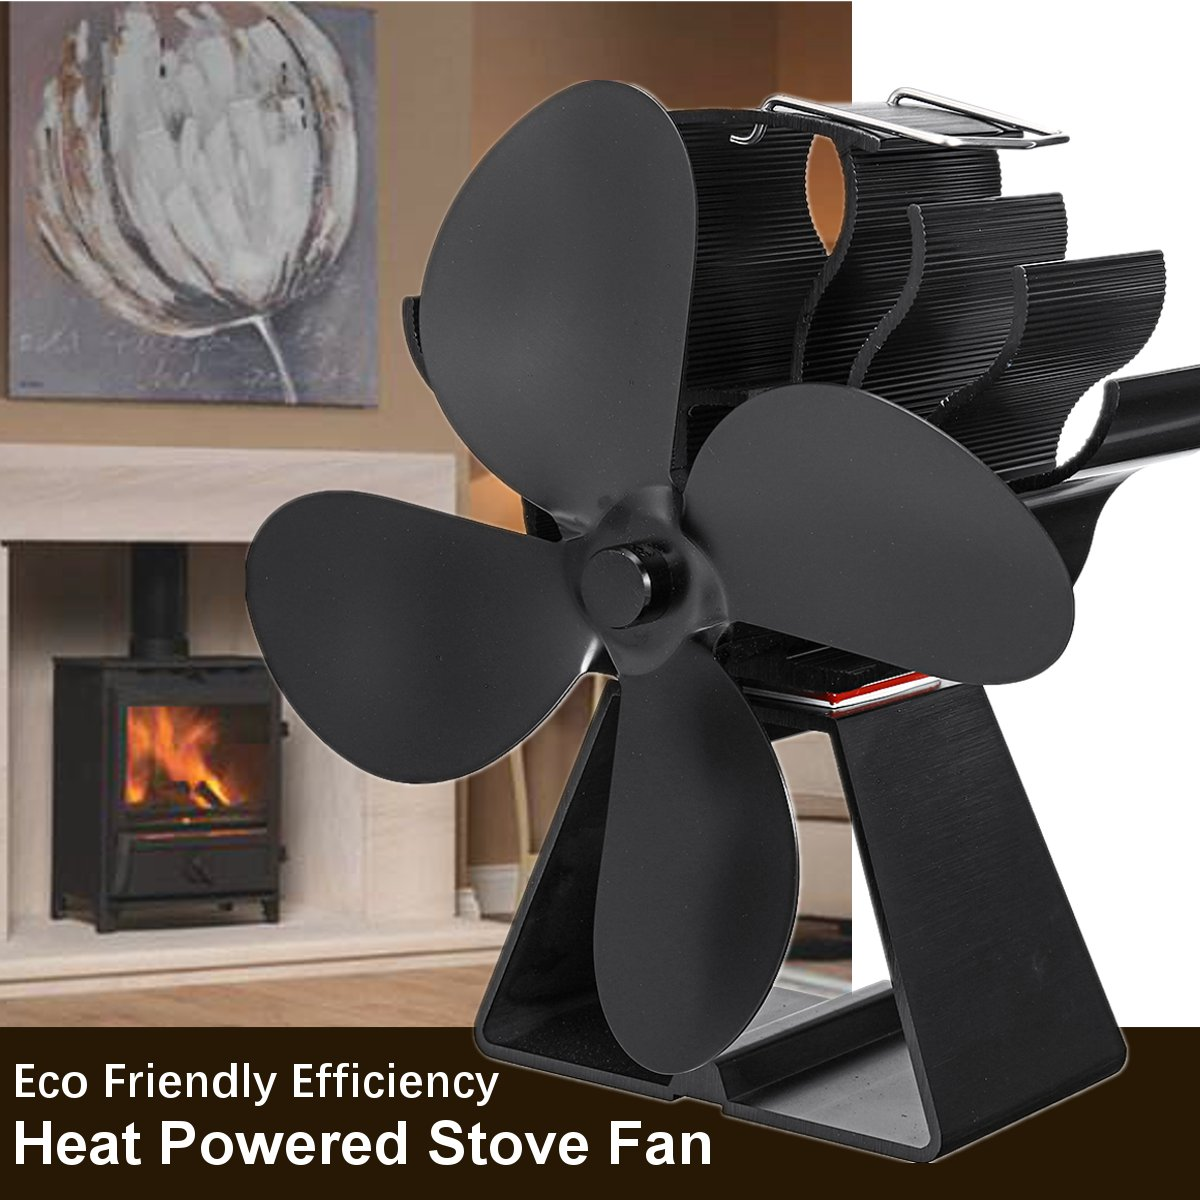 Black 4 Blades Heat Powered Stove Fan Eco Friendly Efficiency Wood Log Burner Fireplace Fan Parts Heat Distribution Fuel Saving